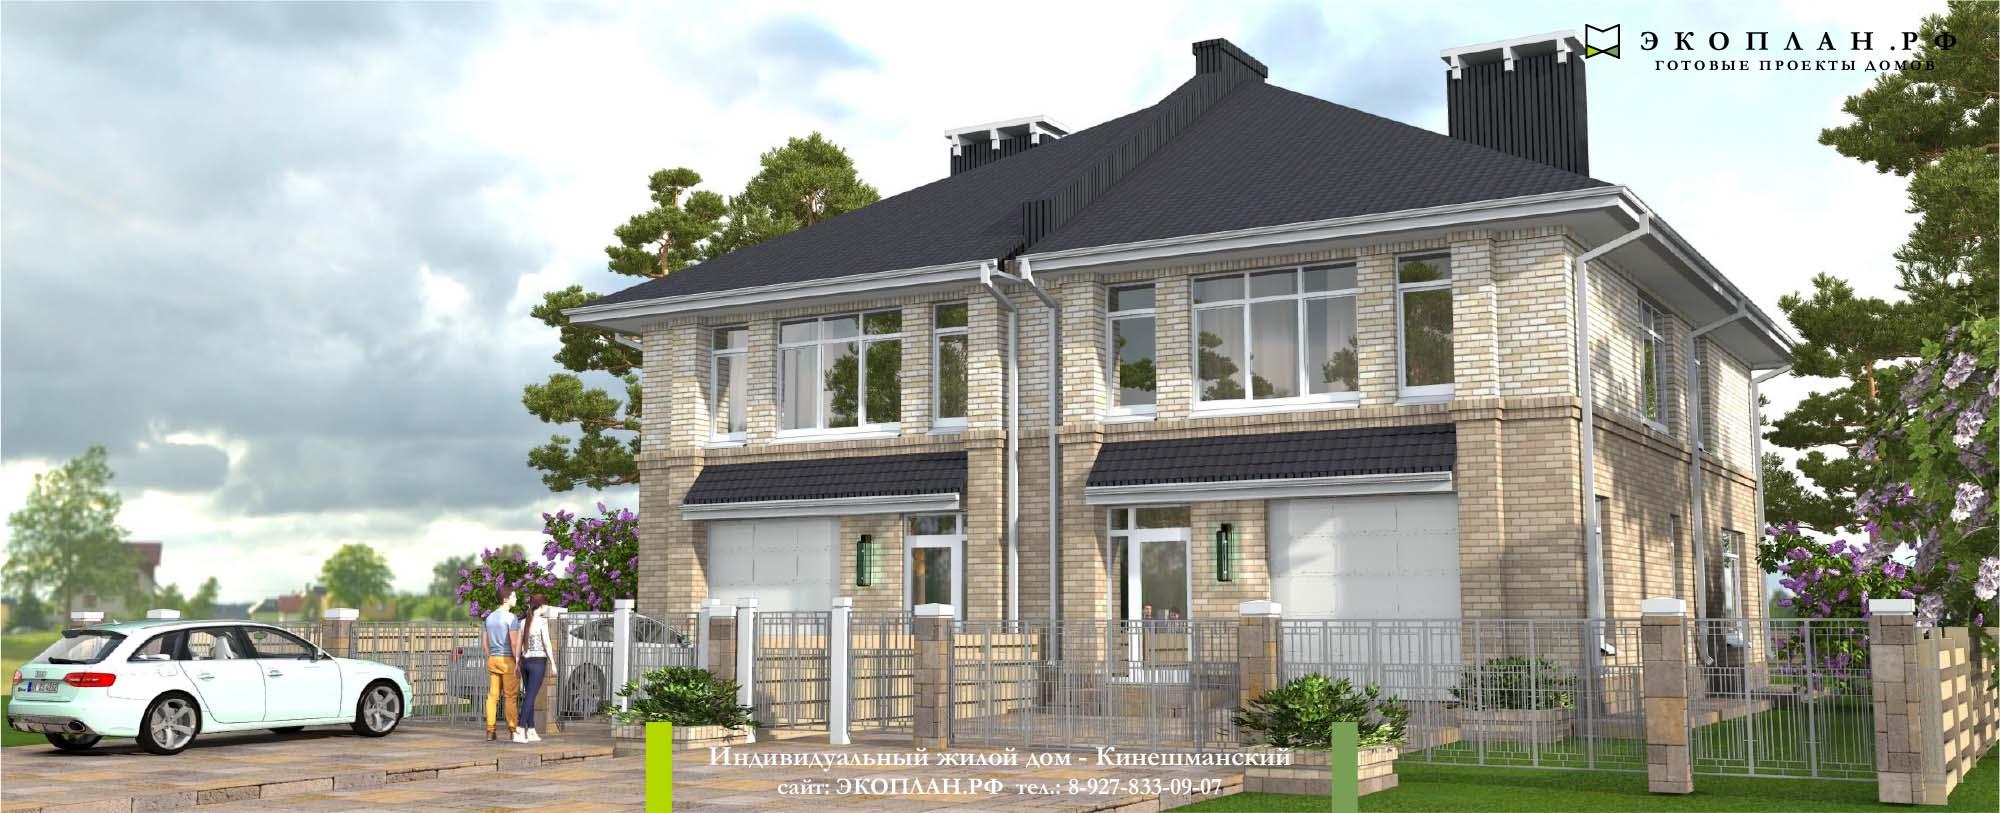 Кинешманский - Проект дома на две семьи - Экоплан фасад